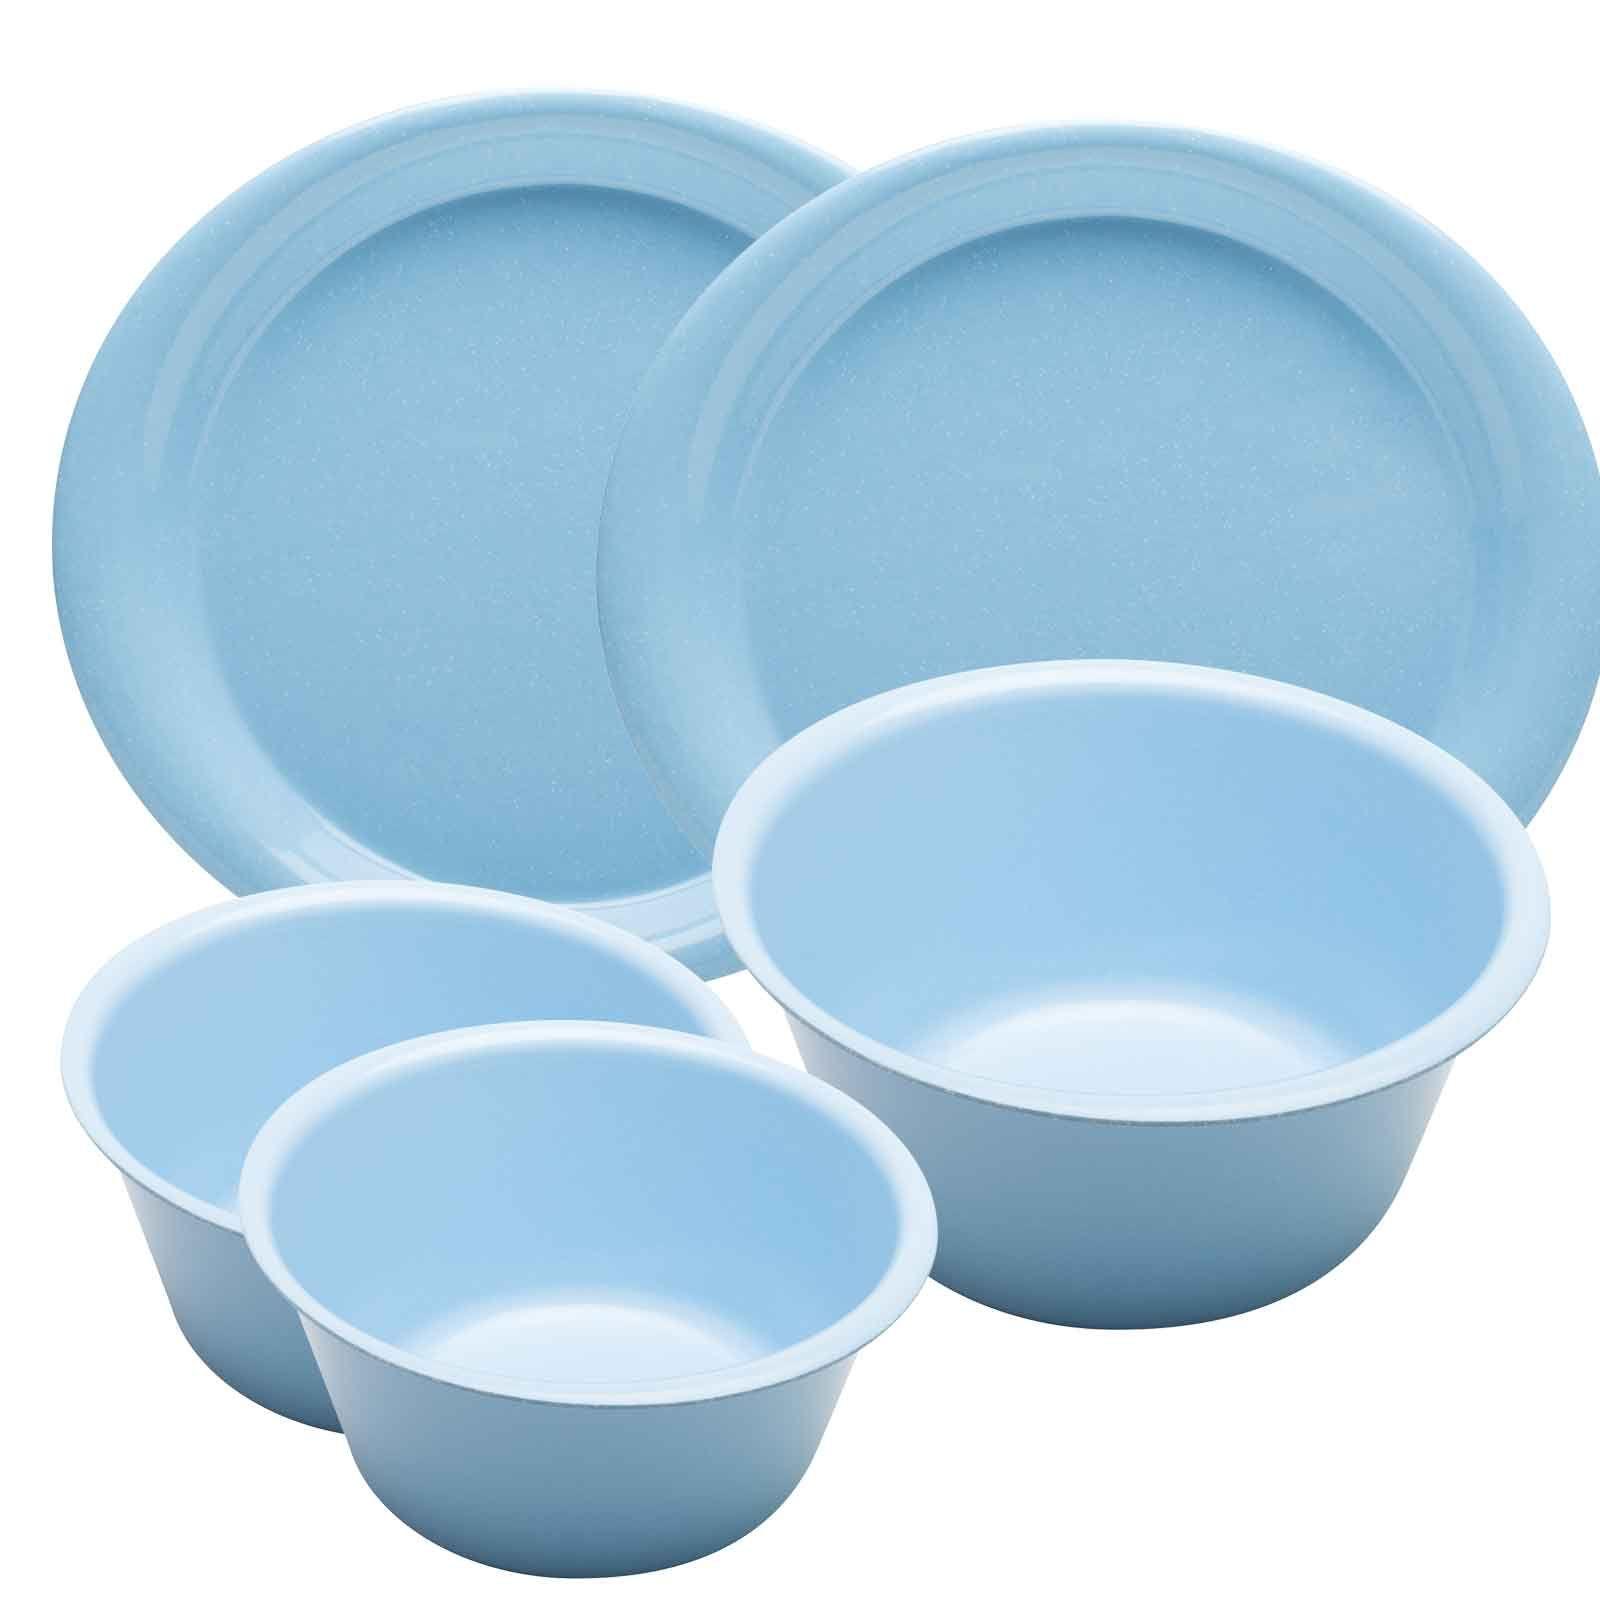 Zakwave Microwave Safe 5 Piece Dinner Set Sky Blue Shown In Sky Blue Microwave Plate Meal Time Microwave